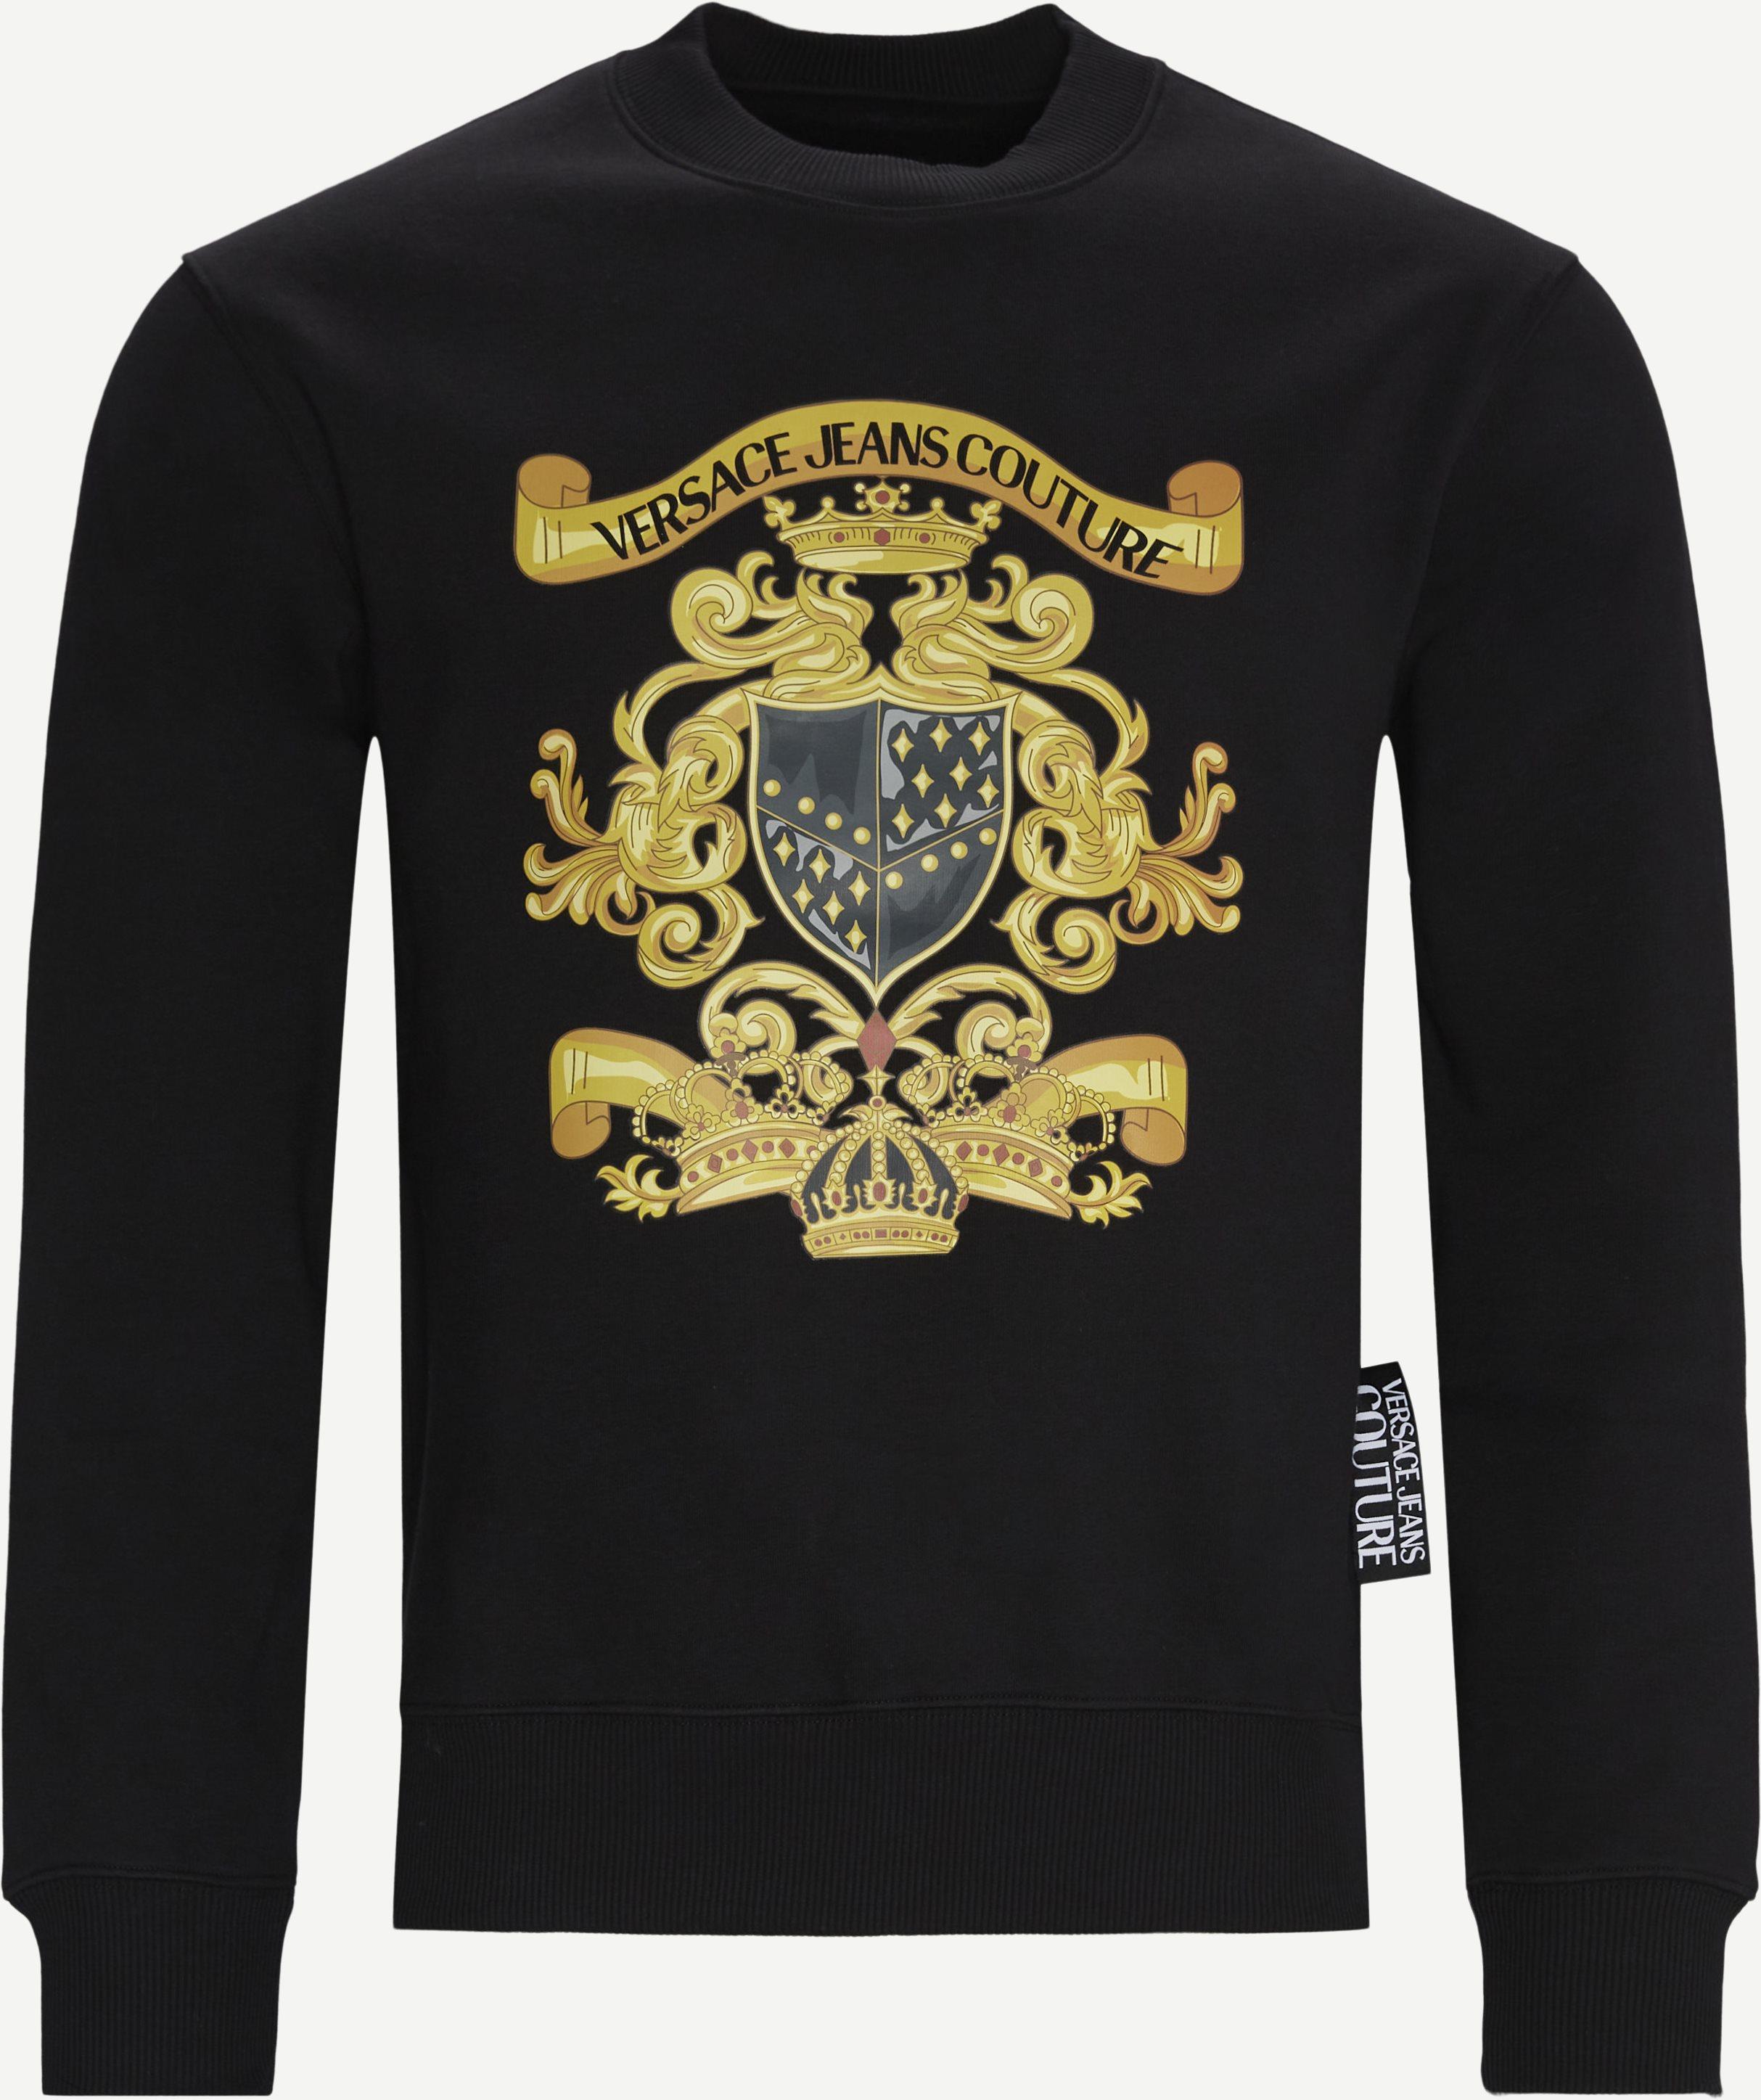 Brushed Evenezia Crewneck Sweatshirt - Sweatshirts - Regular - Svart